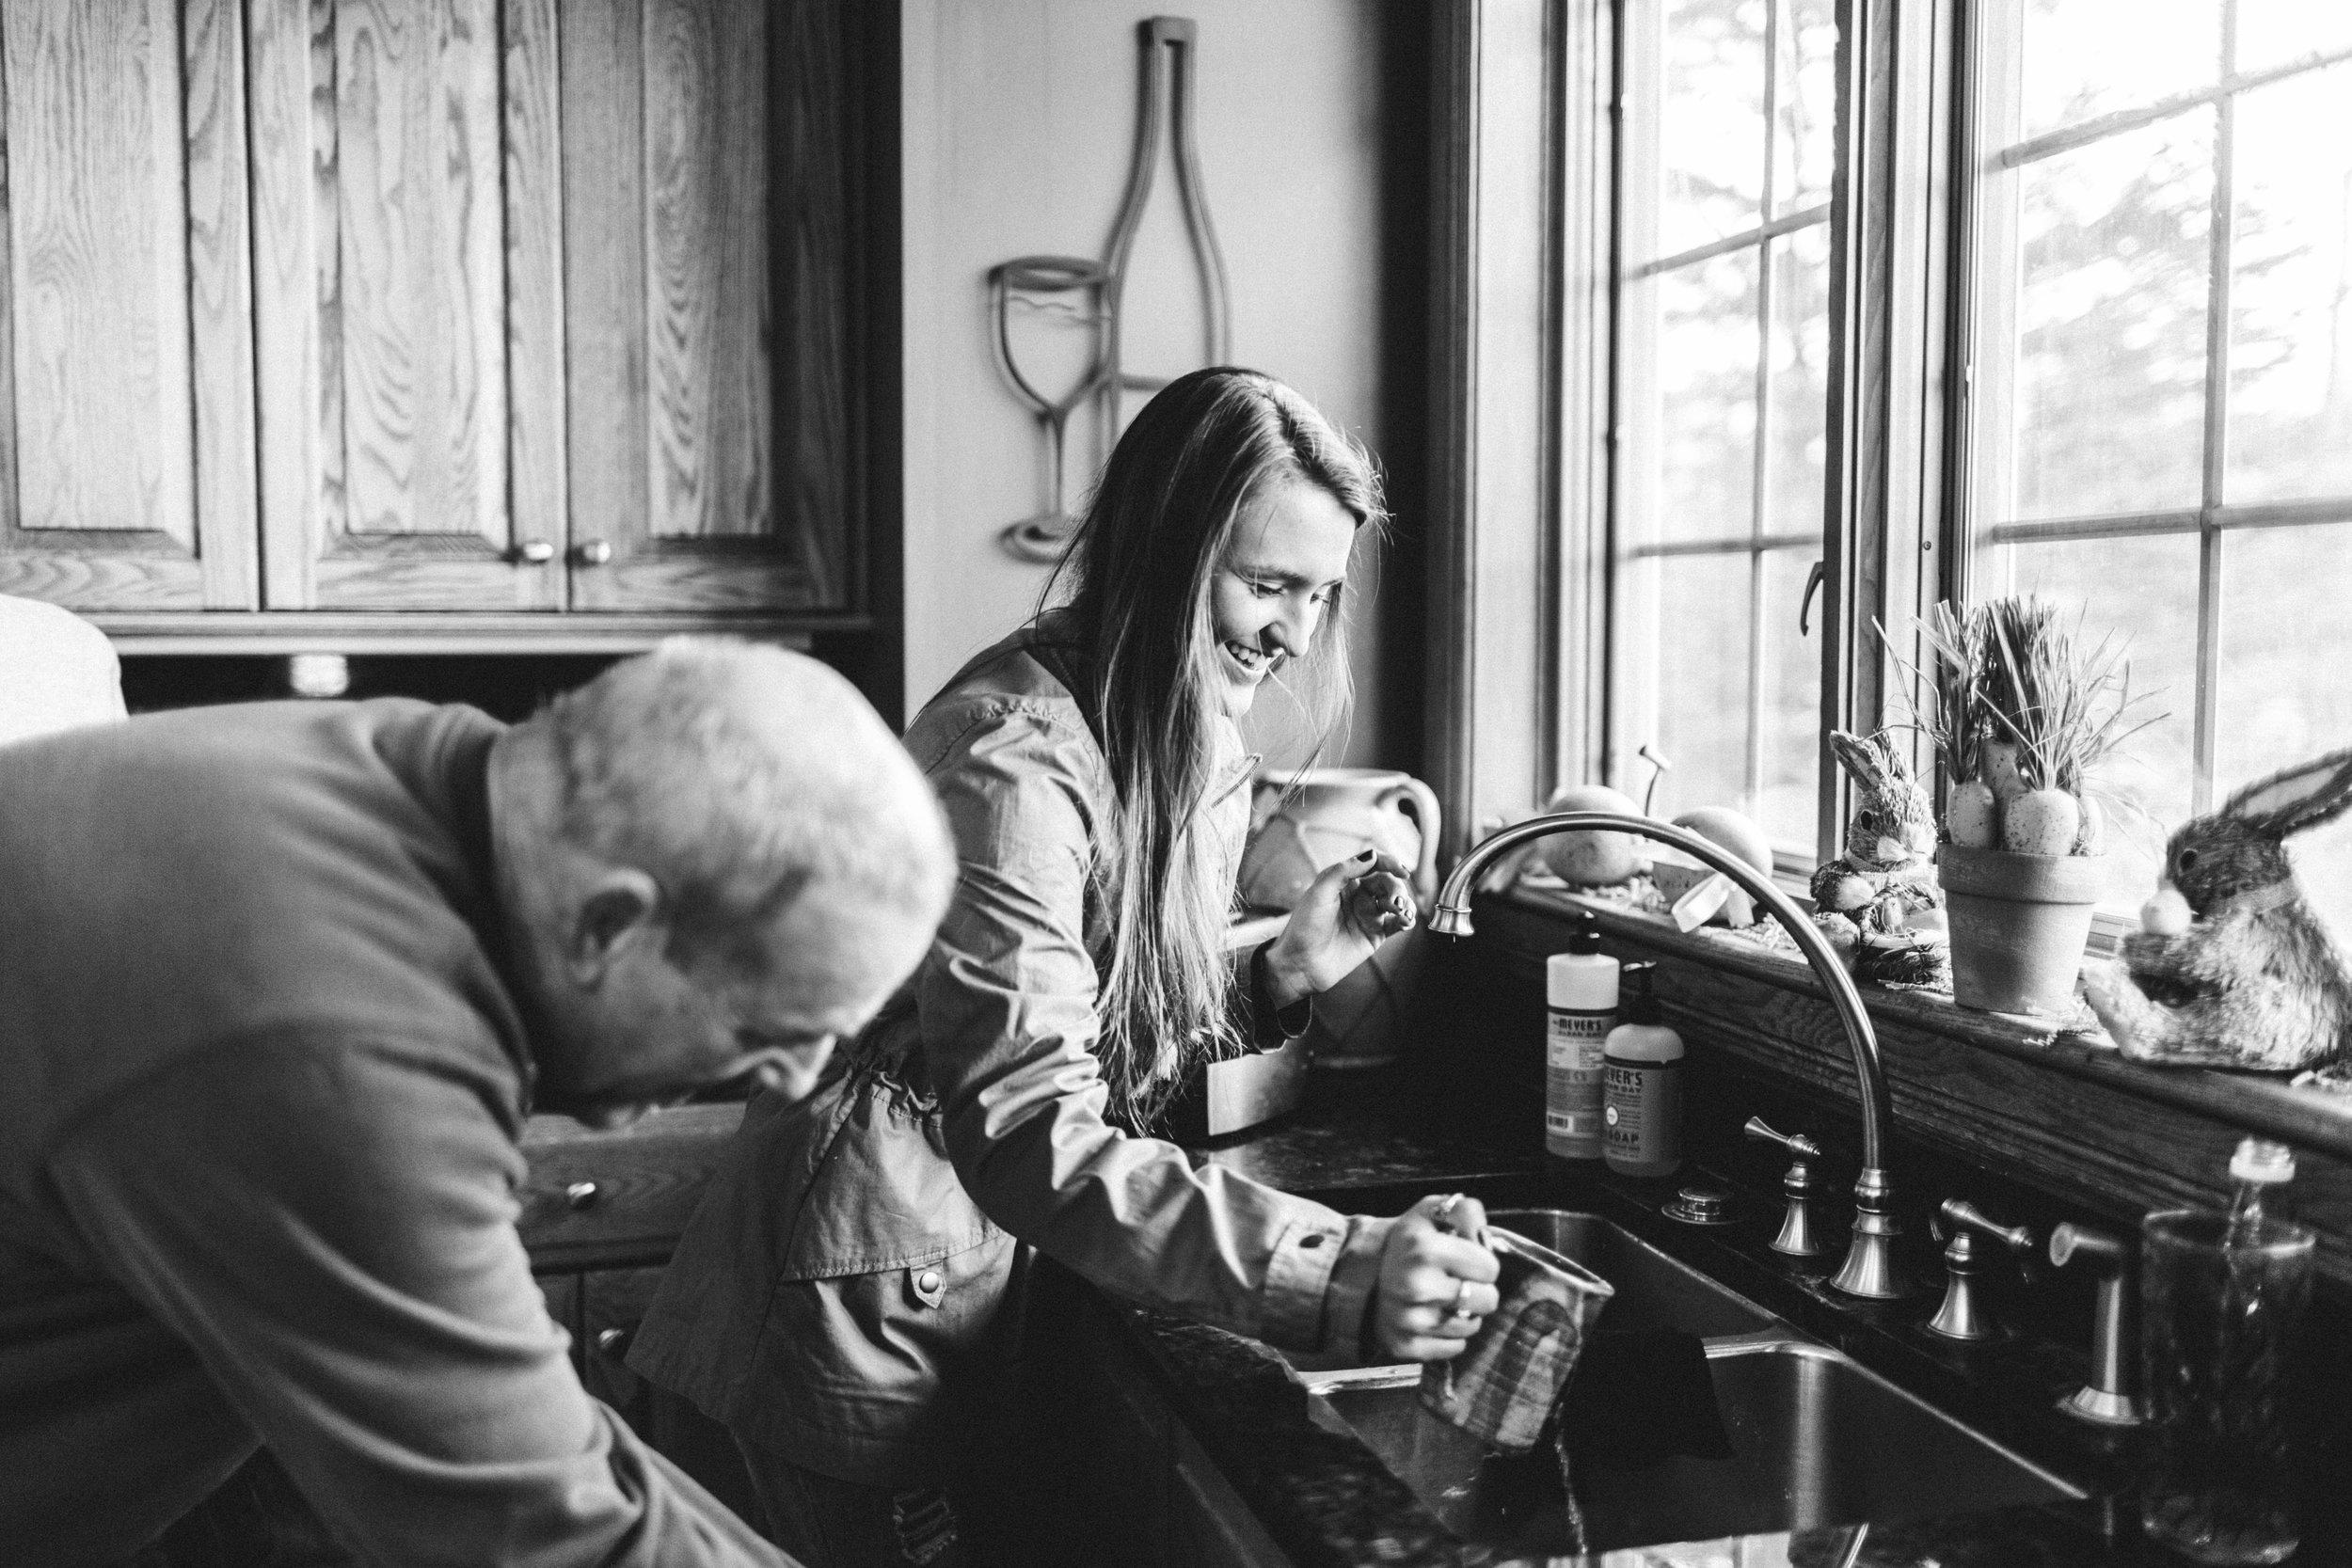 Horse Farm Engagment - Sabrina Leigh Studios - Northern Michigan Wedding Photographer 20.jpg